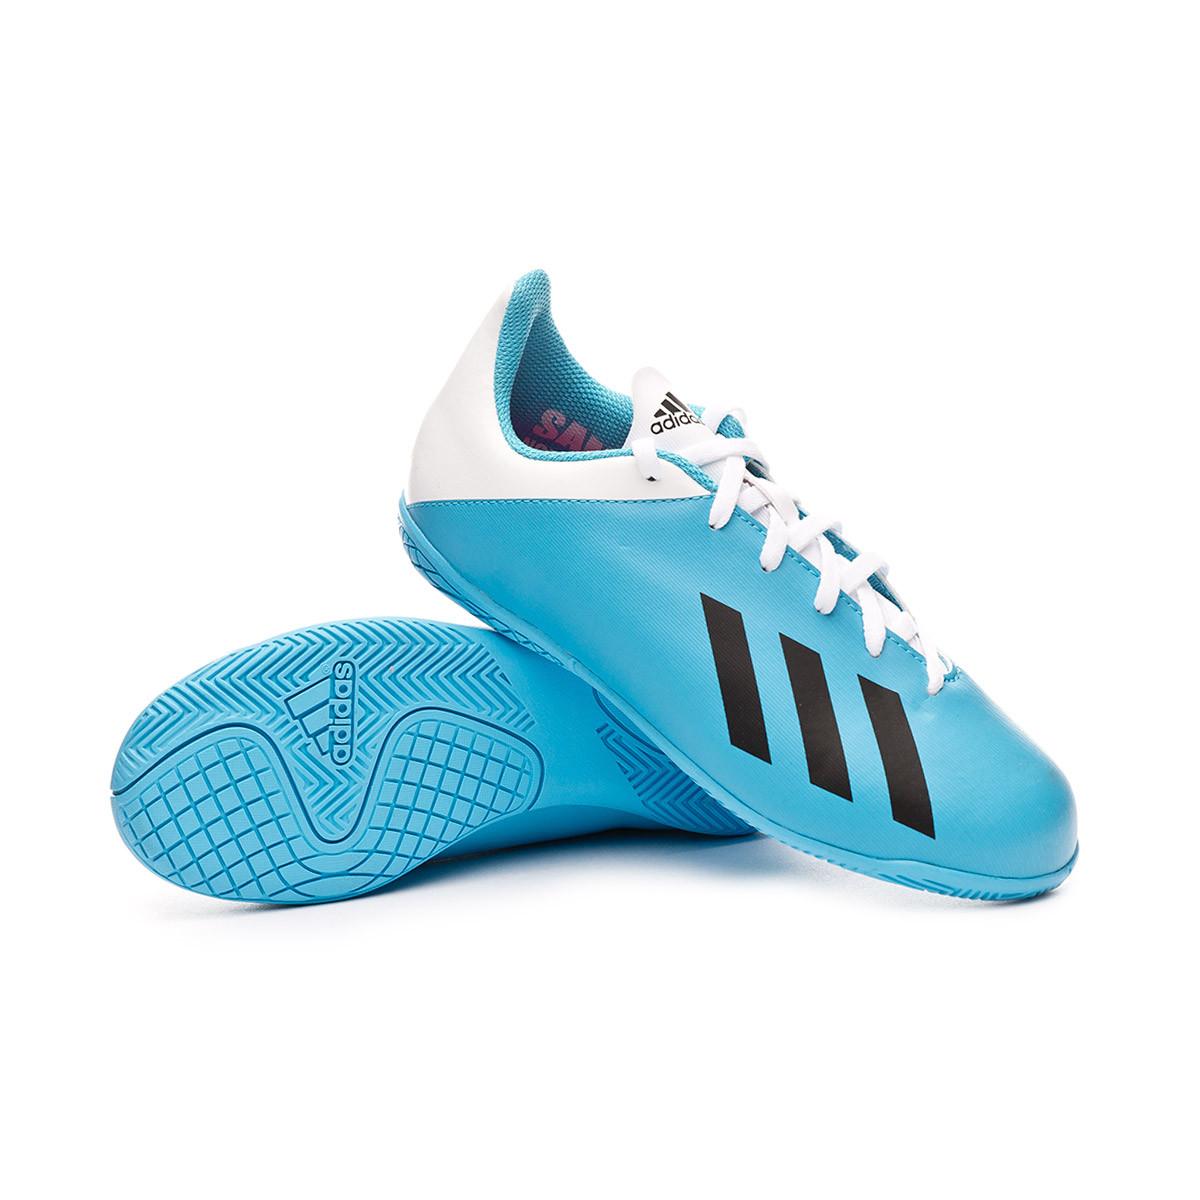 chaussure futsal adidas enfant